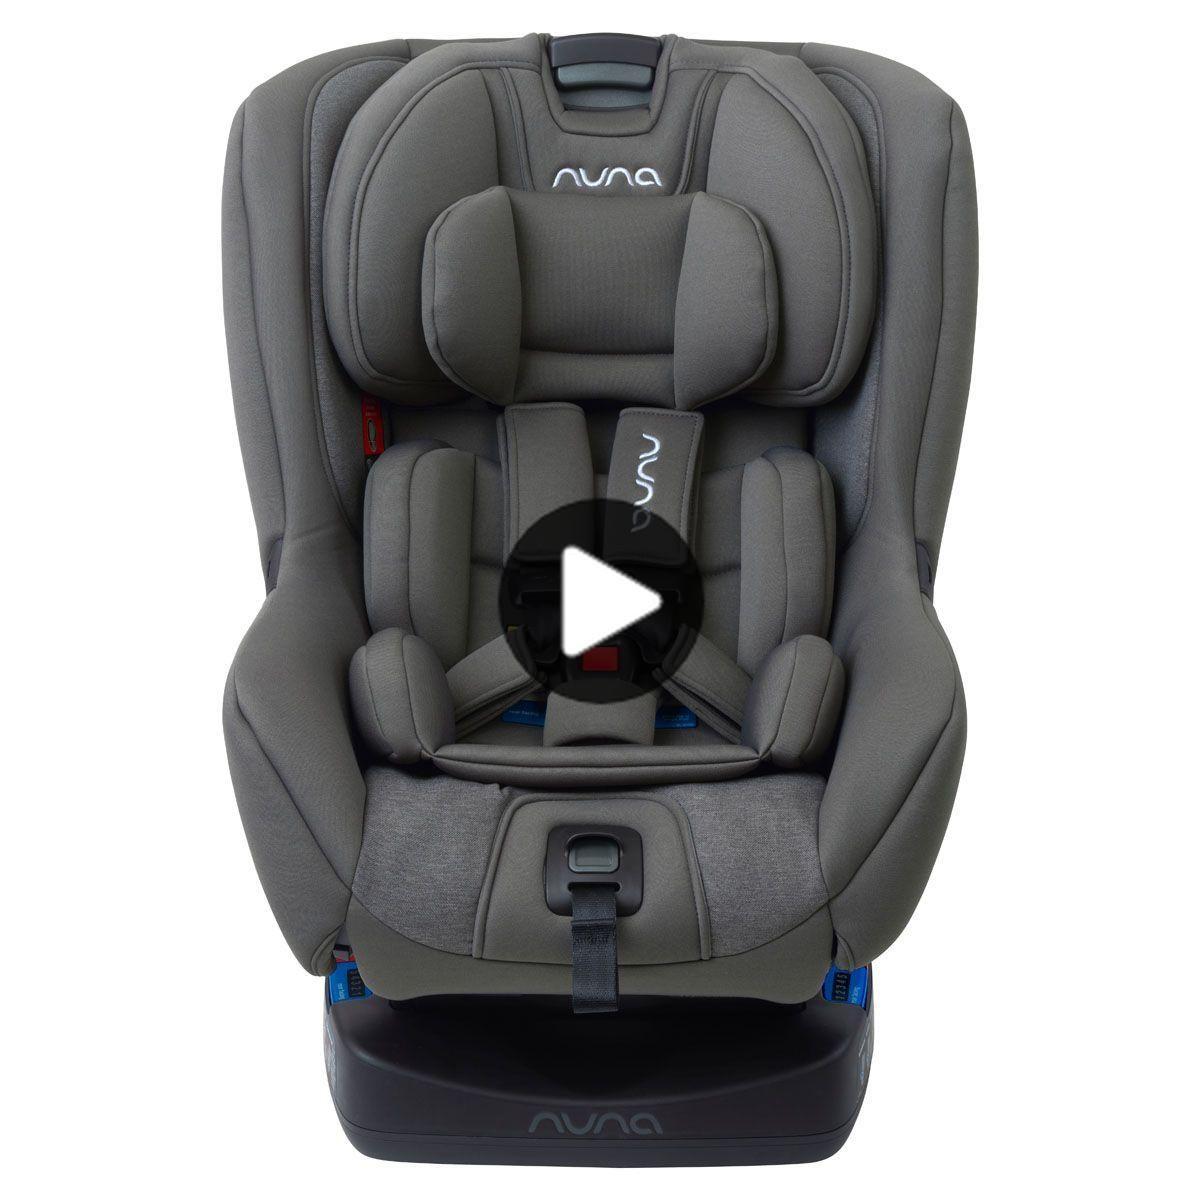 Nuna Rava Car Seat (Color Granite) in 2020 Car seats